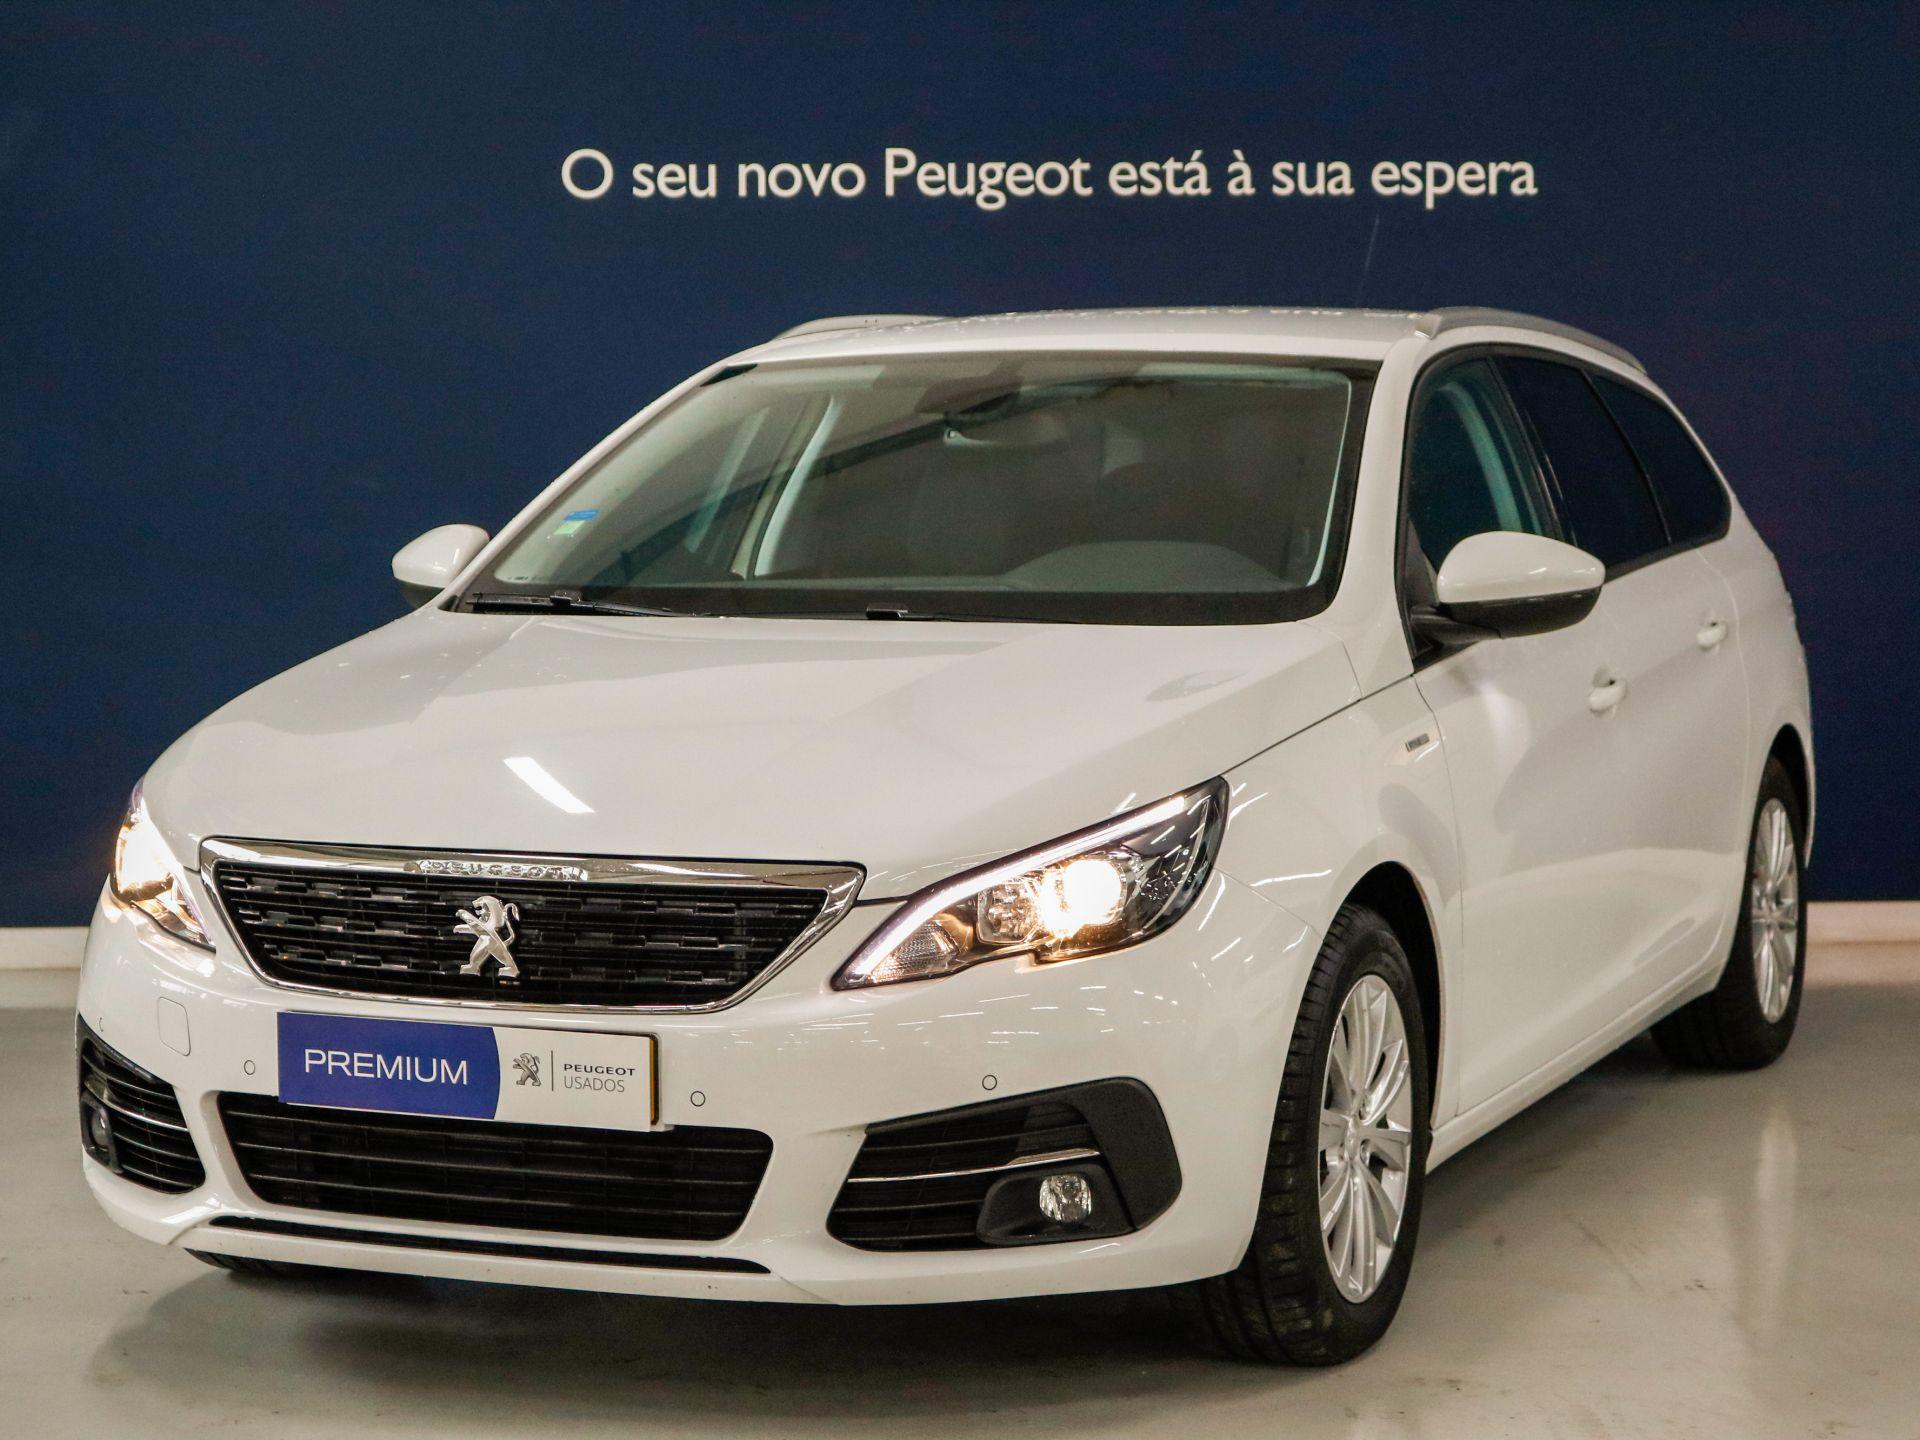 Peugeot 308 SW Style 1.5 BlueHDi 100cv Eu 6.2d CVM6 SW segunda mão Setúbal